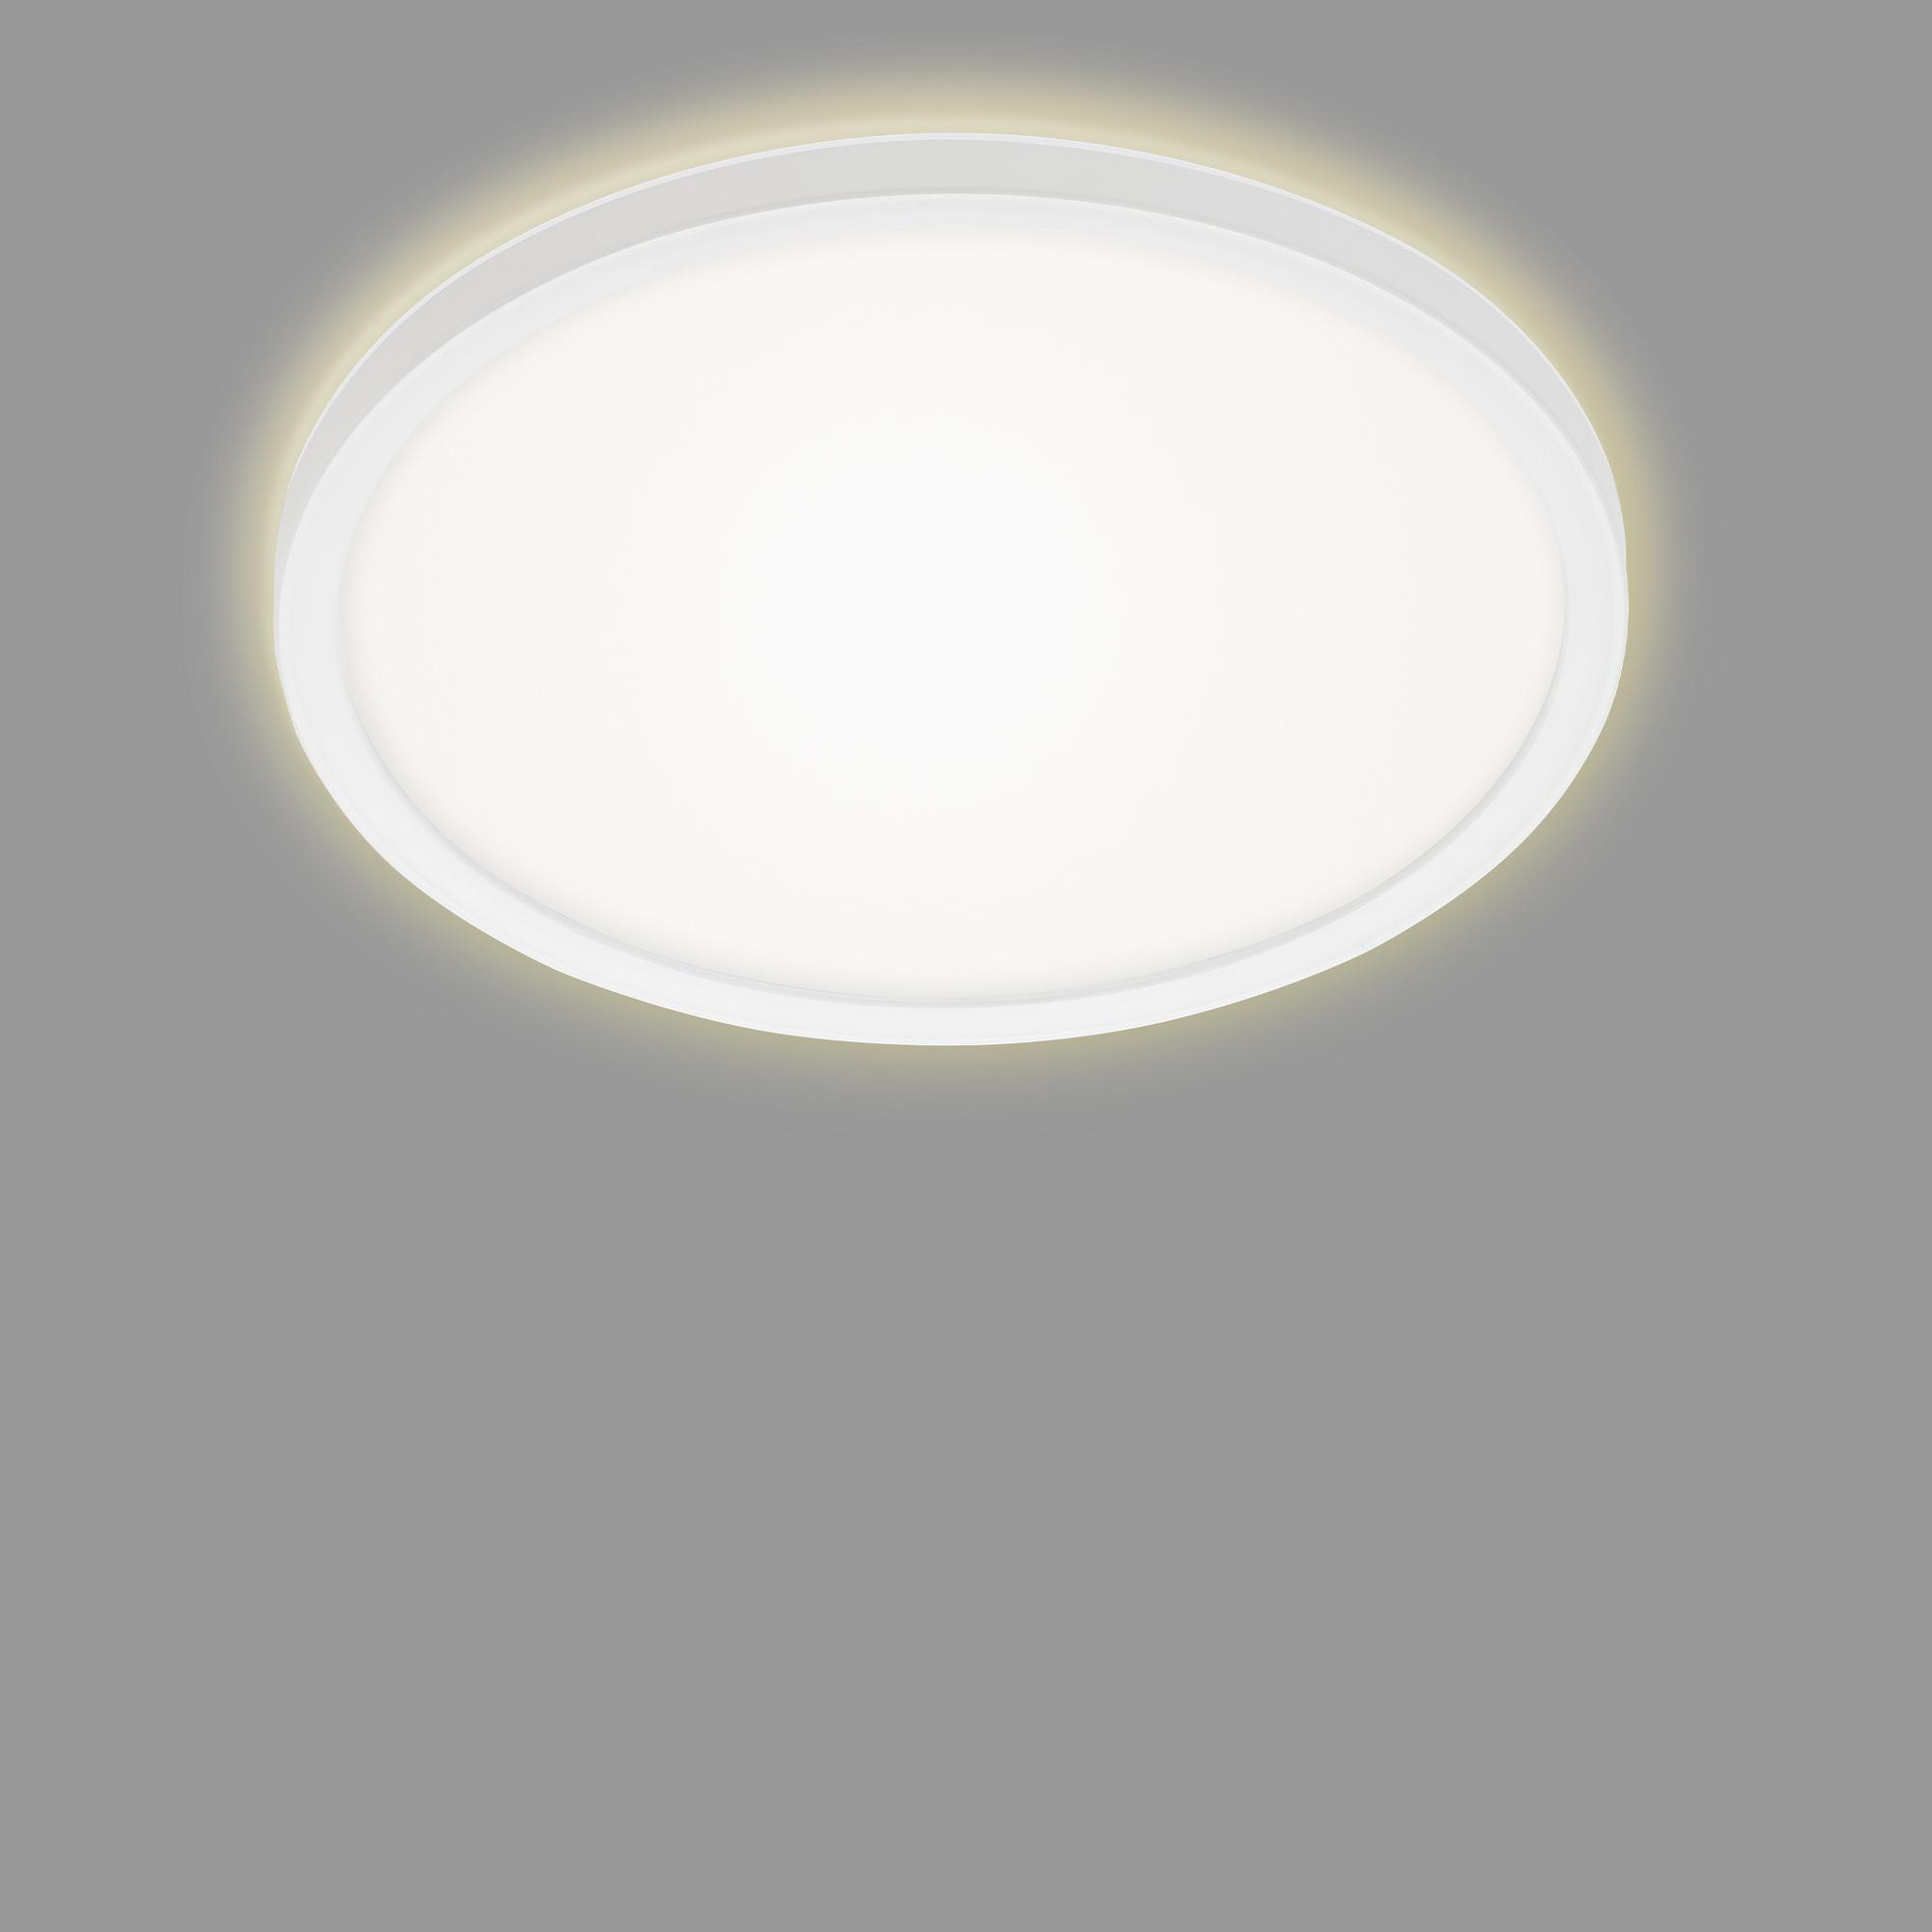 SLIM LED Panel, Ø 29,3 cm, 1850 LUMEN, 15 WATT, Weiss